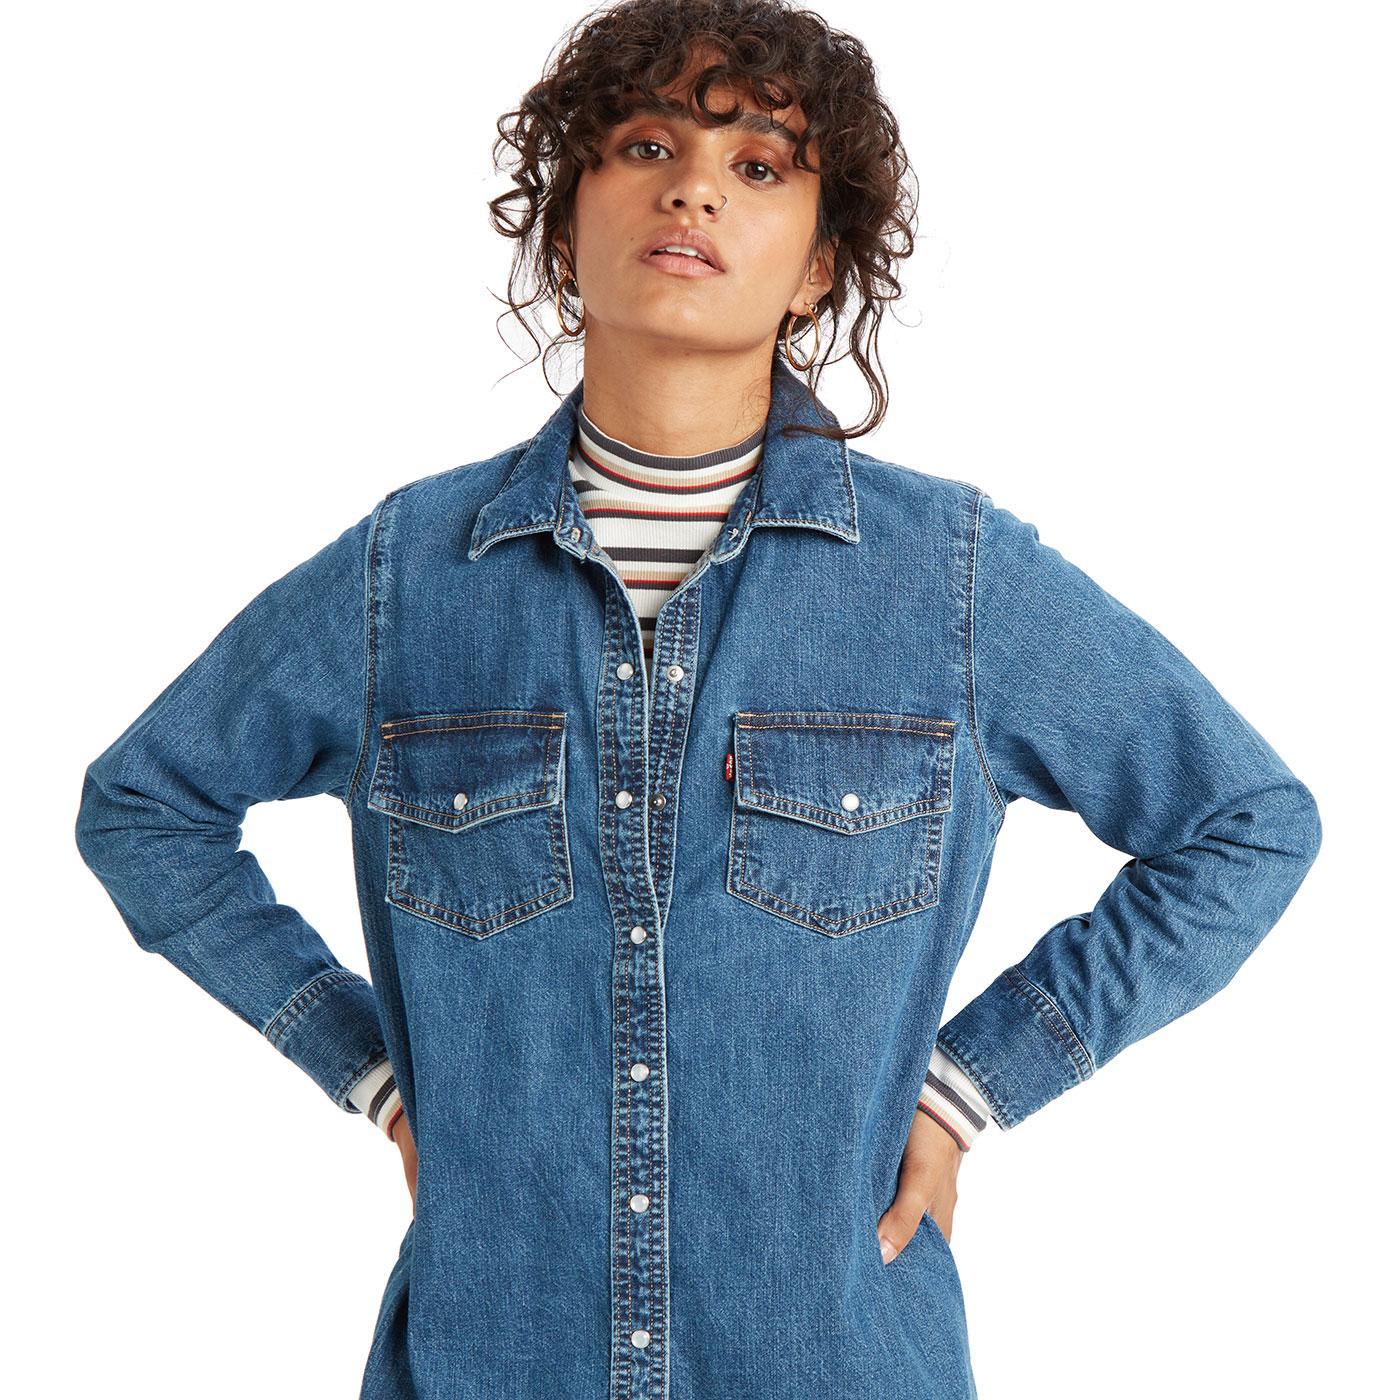 LEVI'S Selma 60s Denim Shirt Dress (Going Steady)